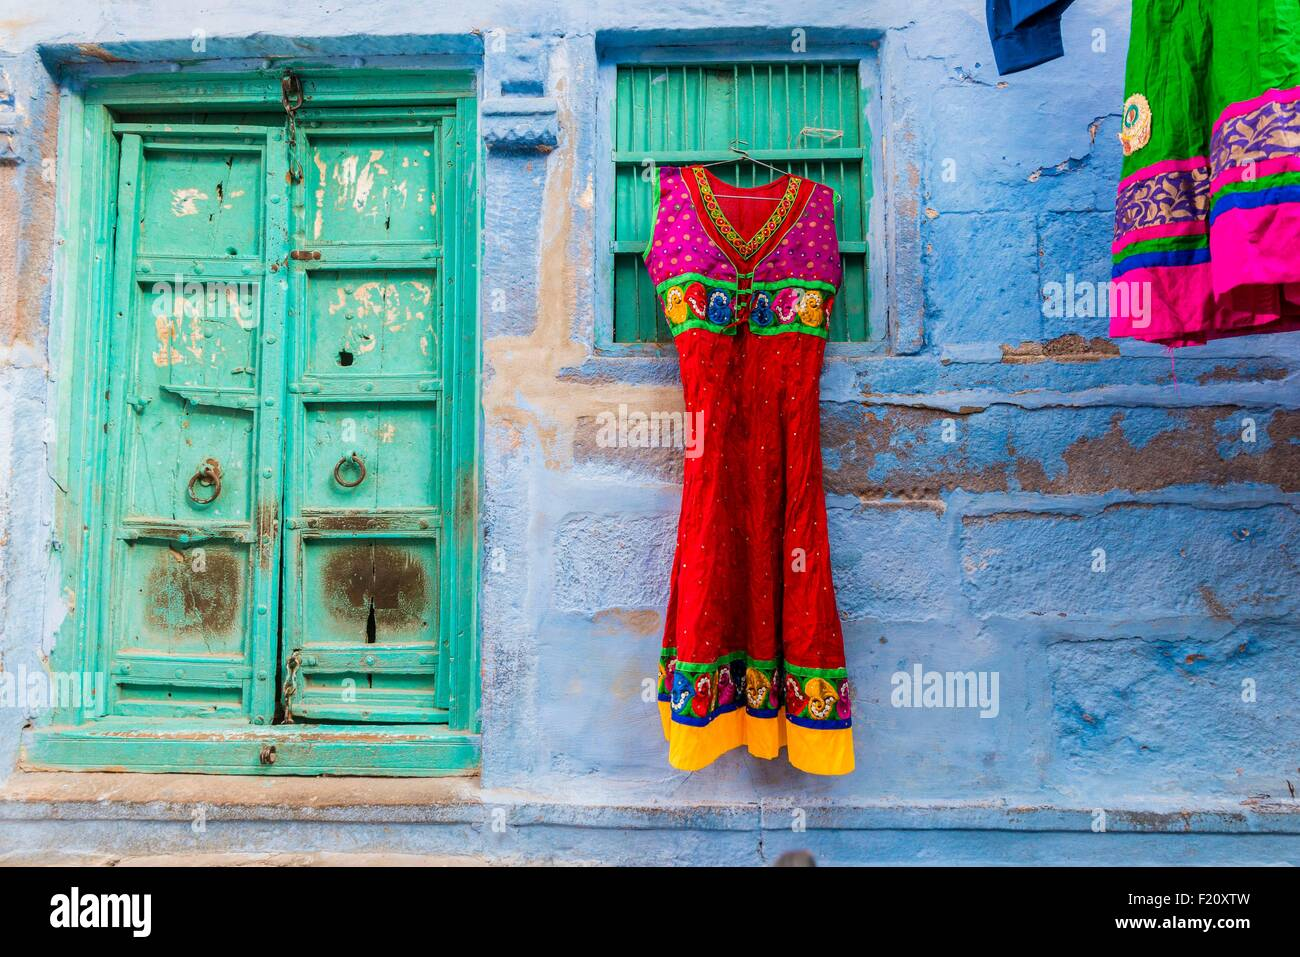 India, Rajasthan state, Jodhpur, the blue city - Stock Image